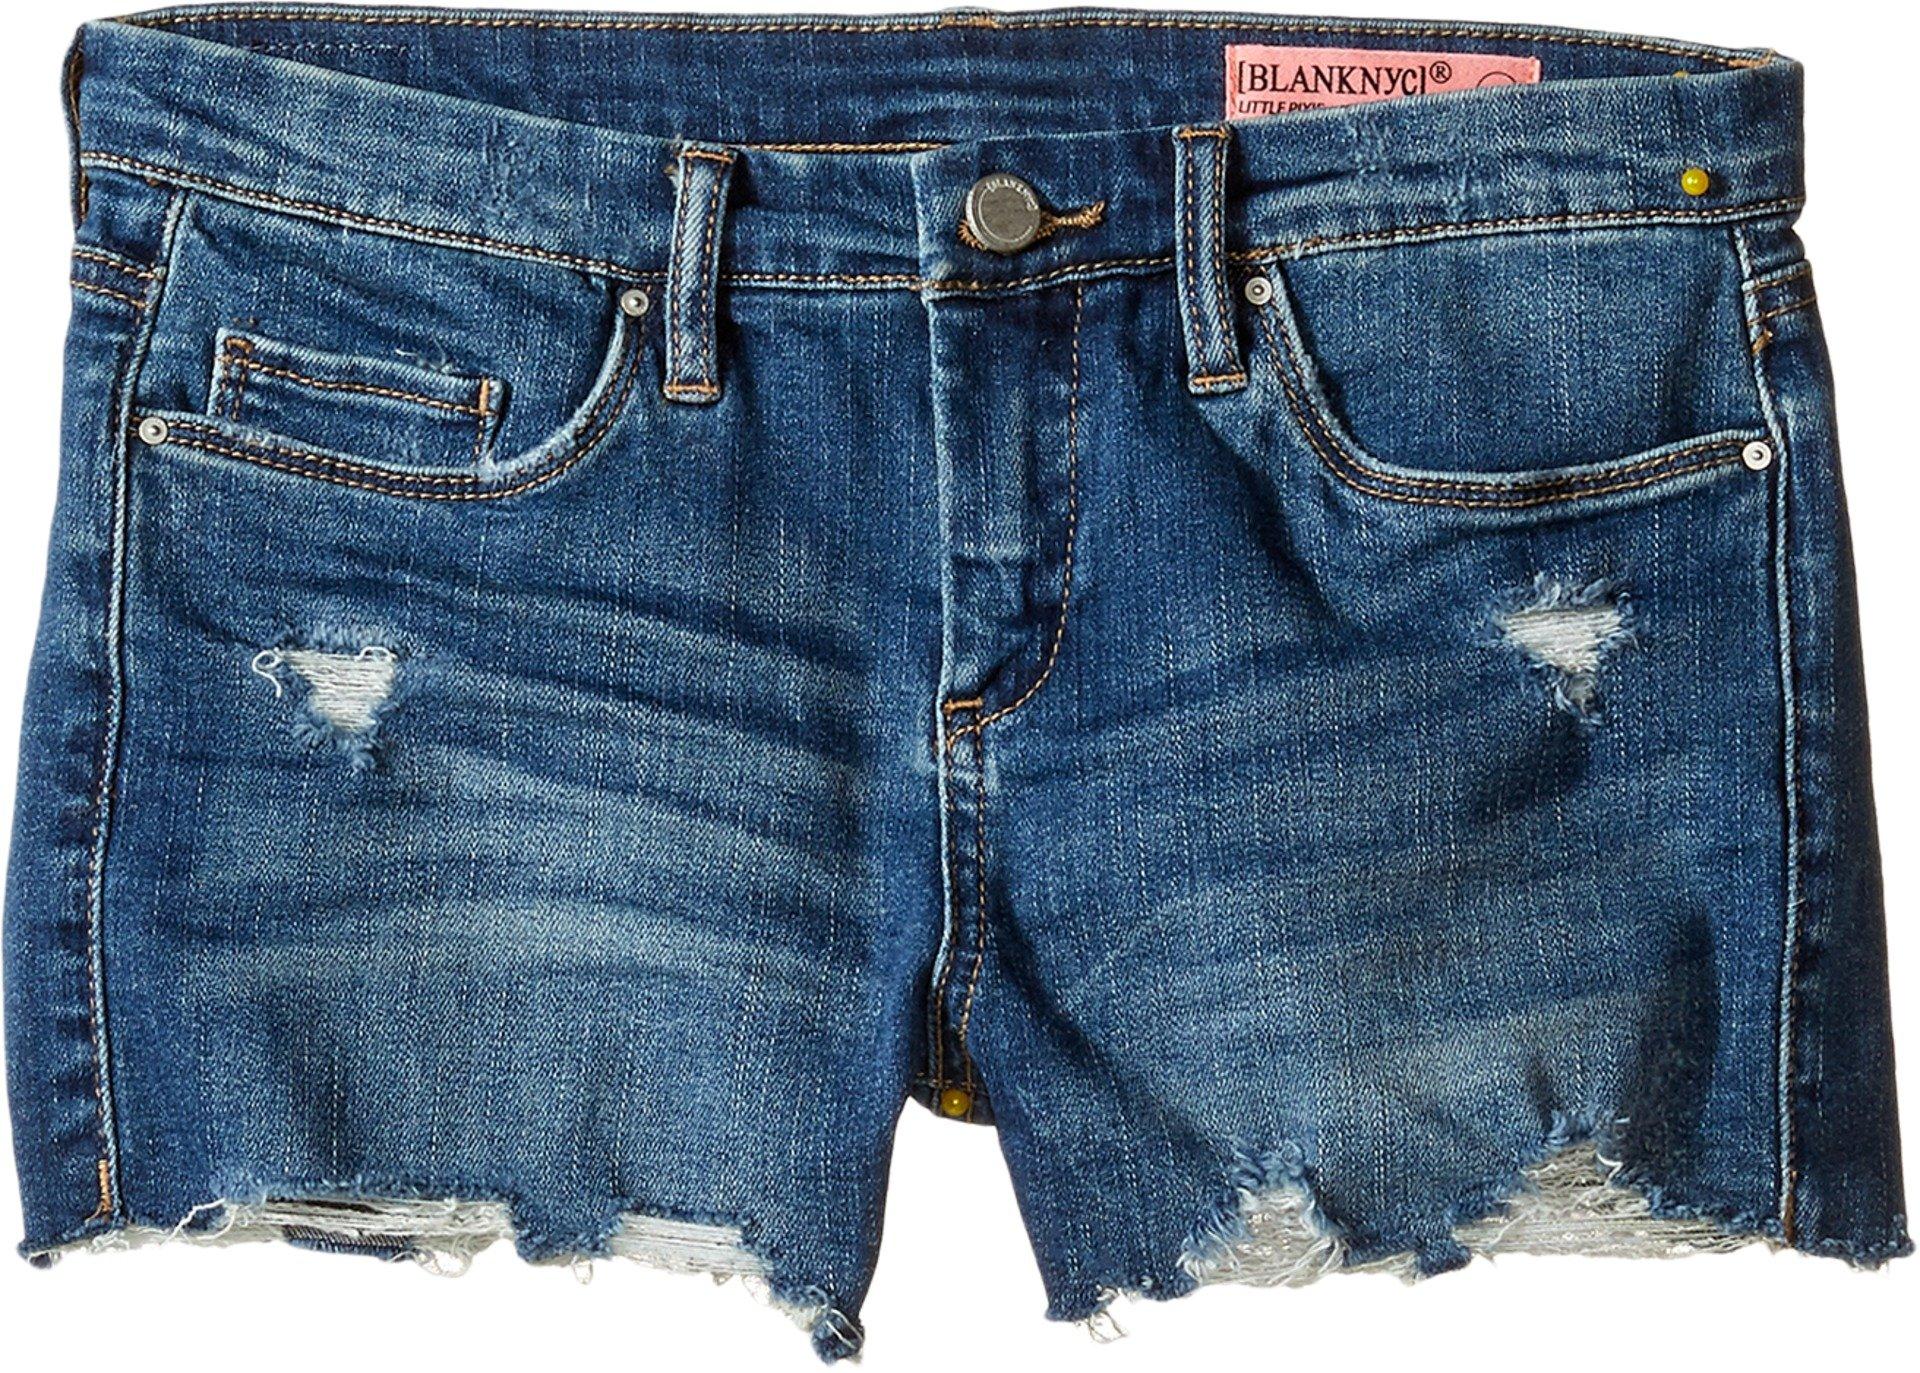 Blank NYC Kids Girl's Denim Distressed Cut Off Shorts (Big Kids) Blue 10 by Blank NYC Kids (Image #1)